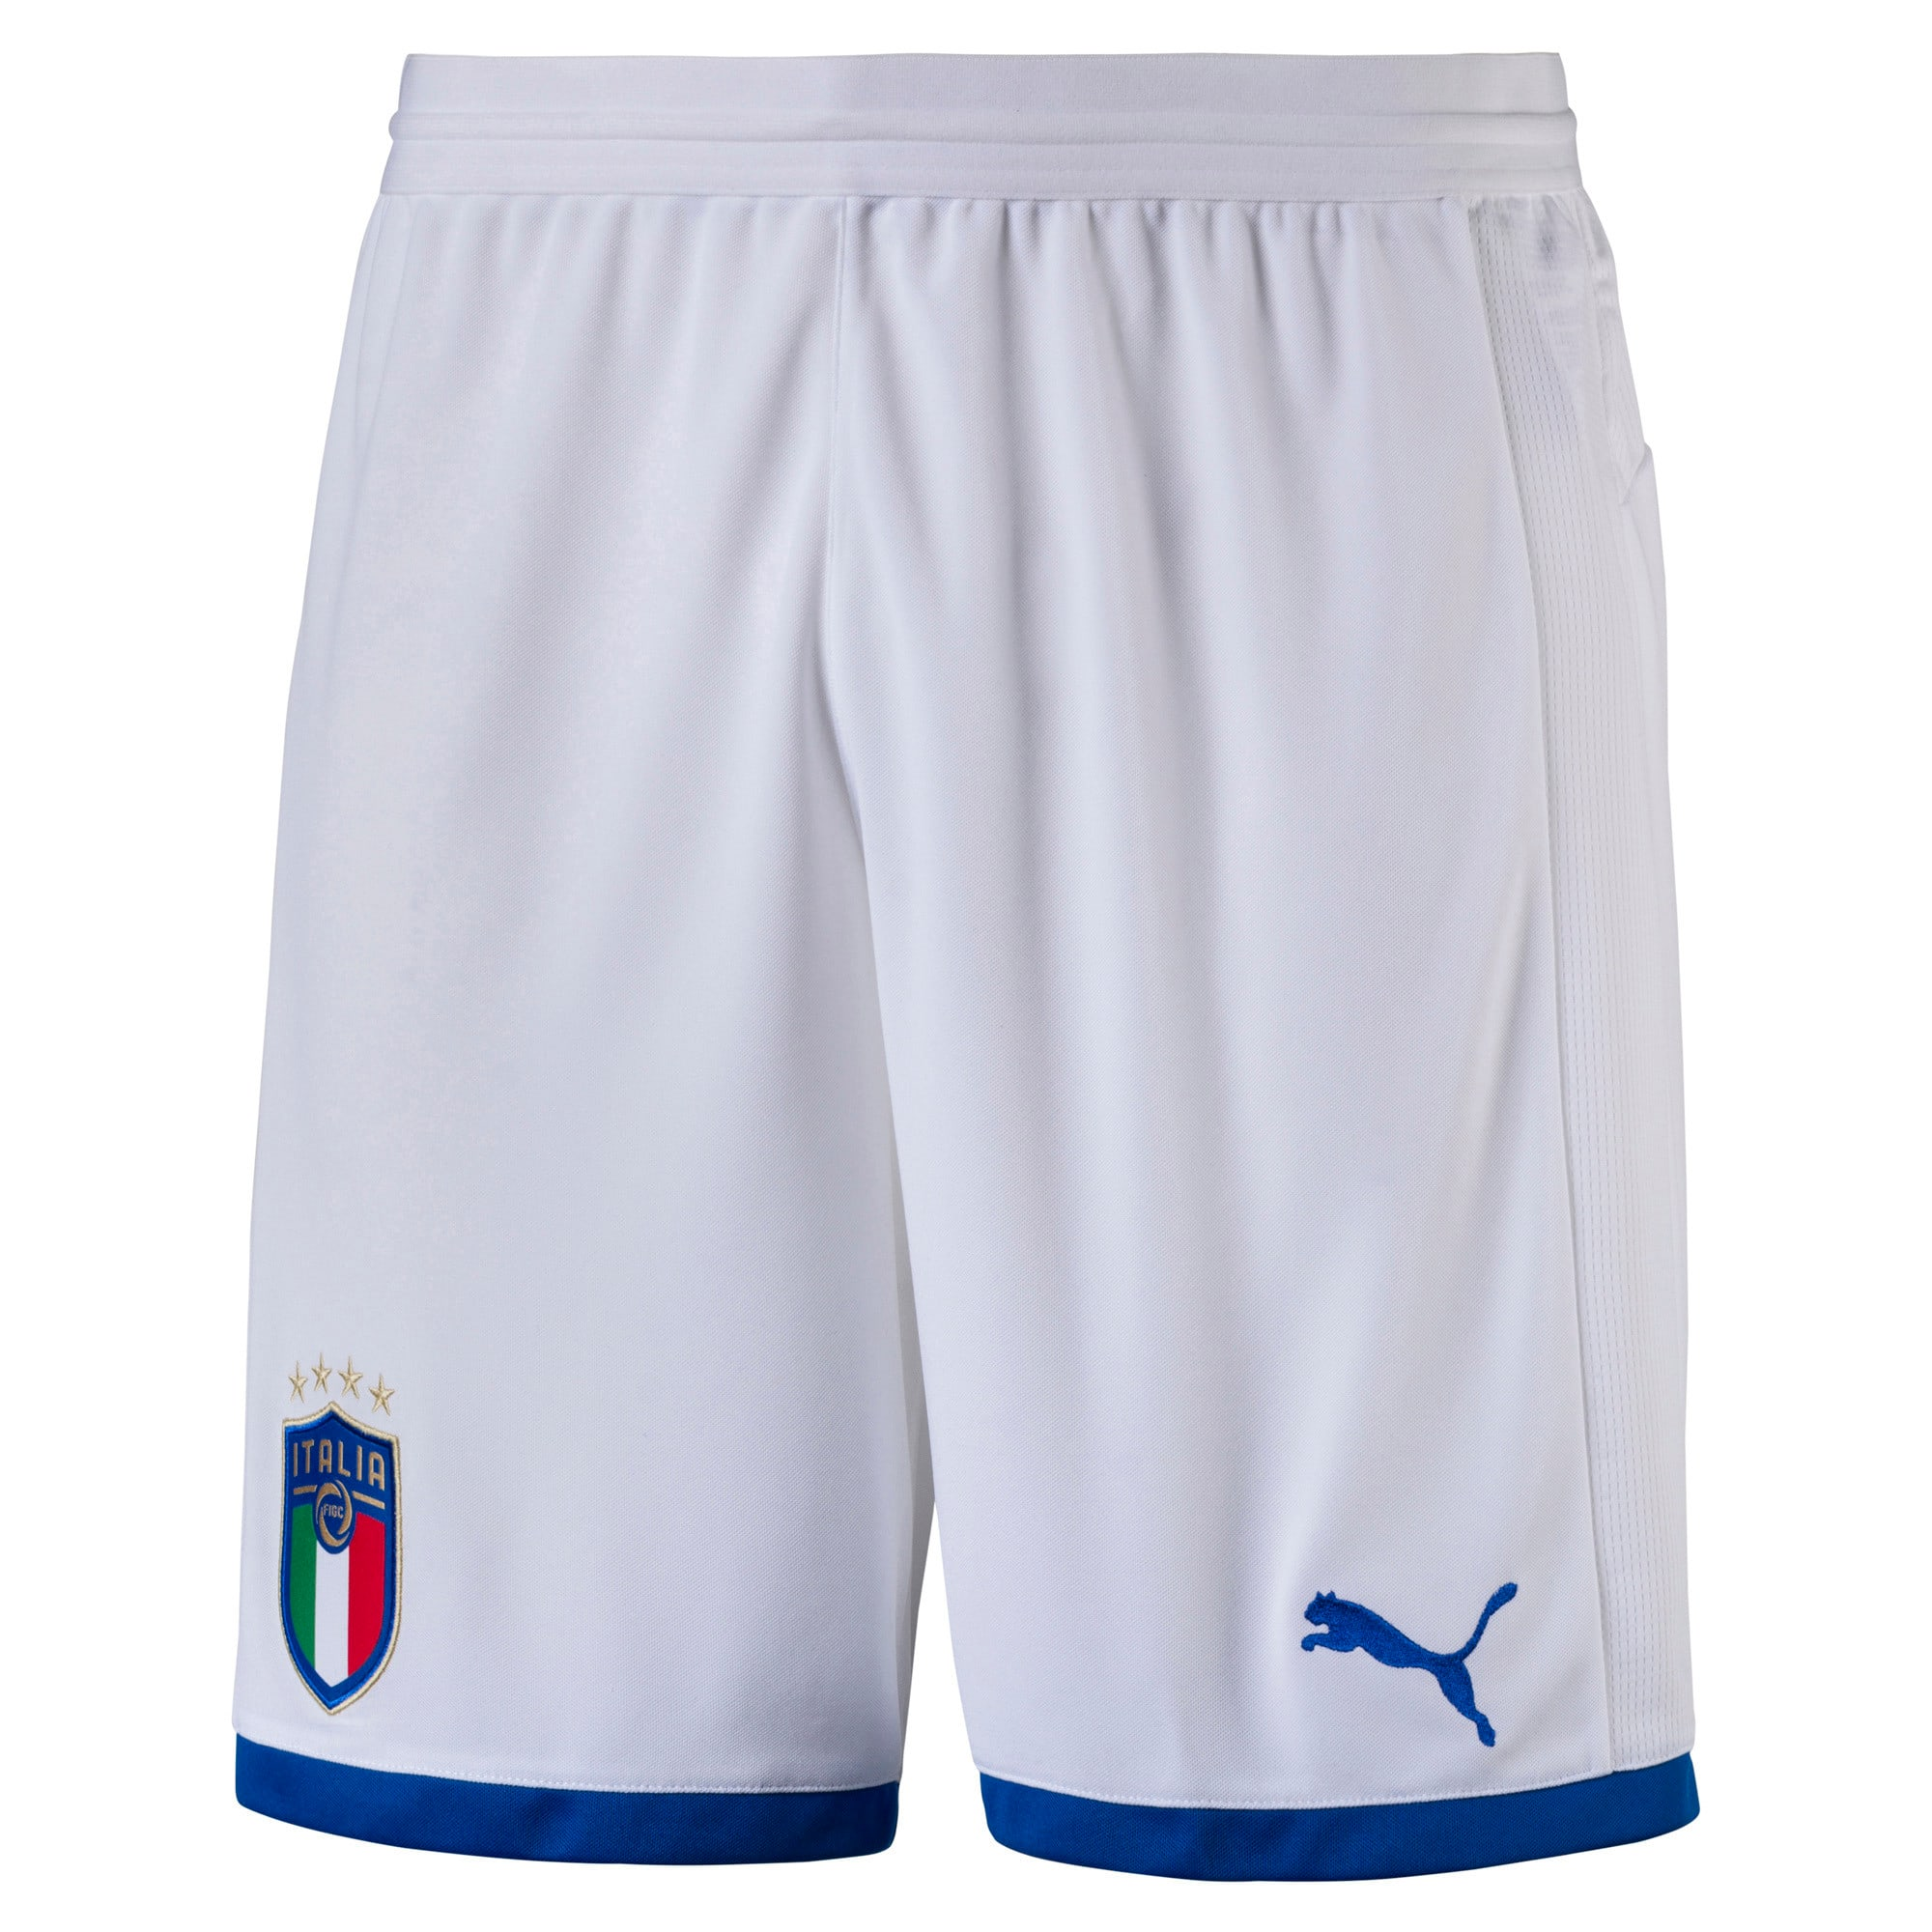 Thumbnail 4 of Italia Replica Shorts, Puma White, medium